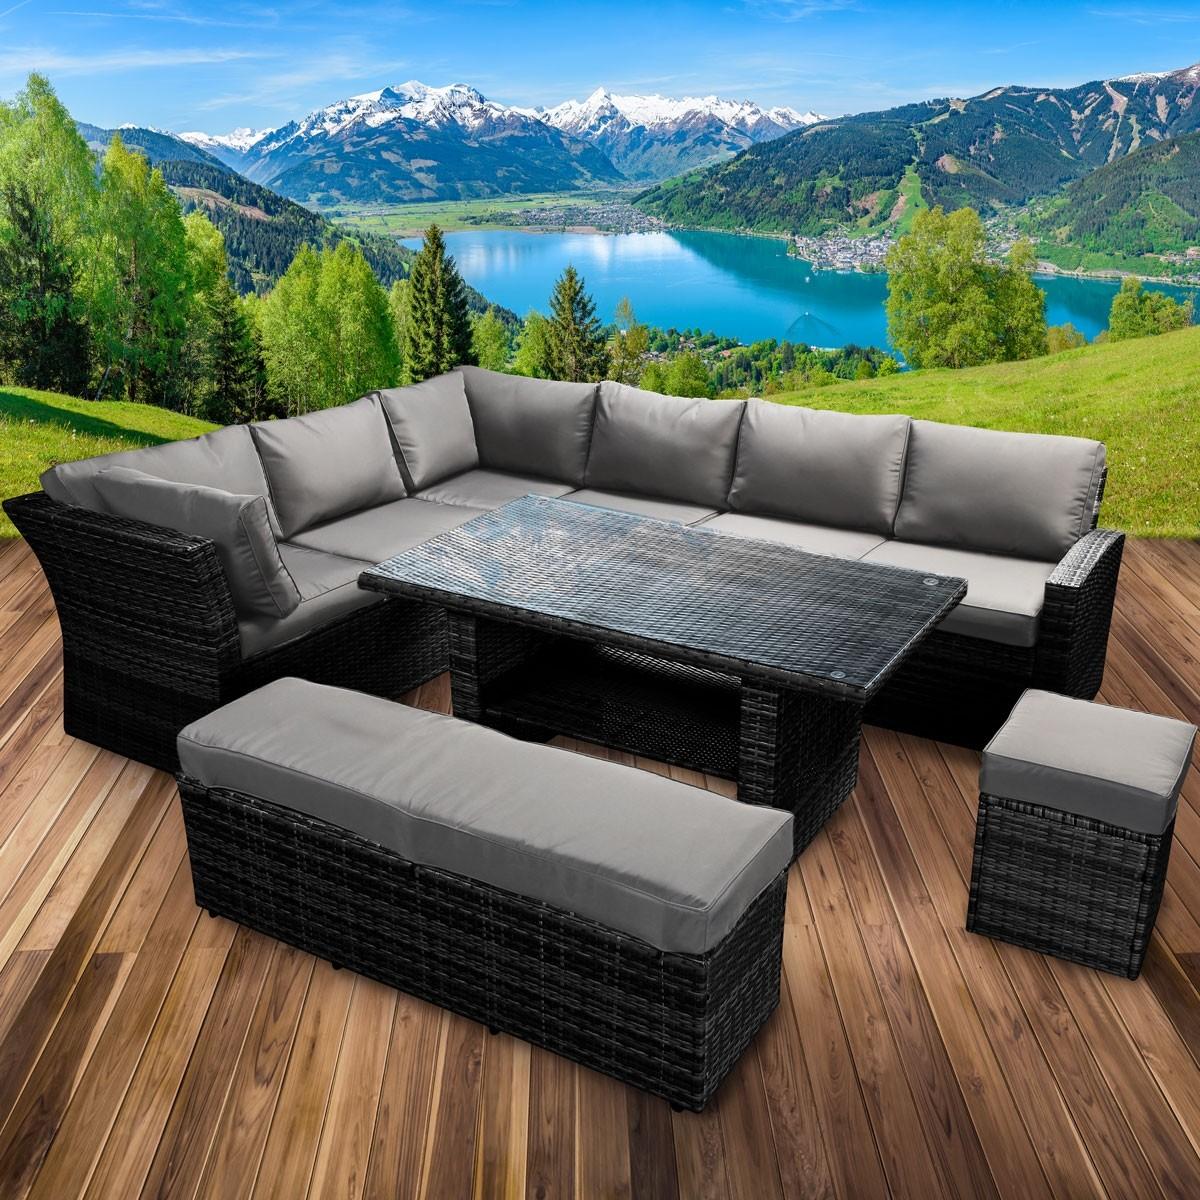 Full Size of Polyrattan Sofa Tchibo Grau Gartensofa Lounge Couch Ausziehbar 2 Sitzer Balkon Garden Set Rattan Outdoor 2 Sitzer Essgruppe Holidays Schwarz Brast24de Muuto Sofa Polyrattan Sofa